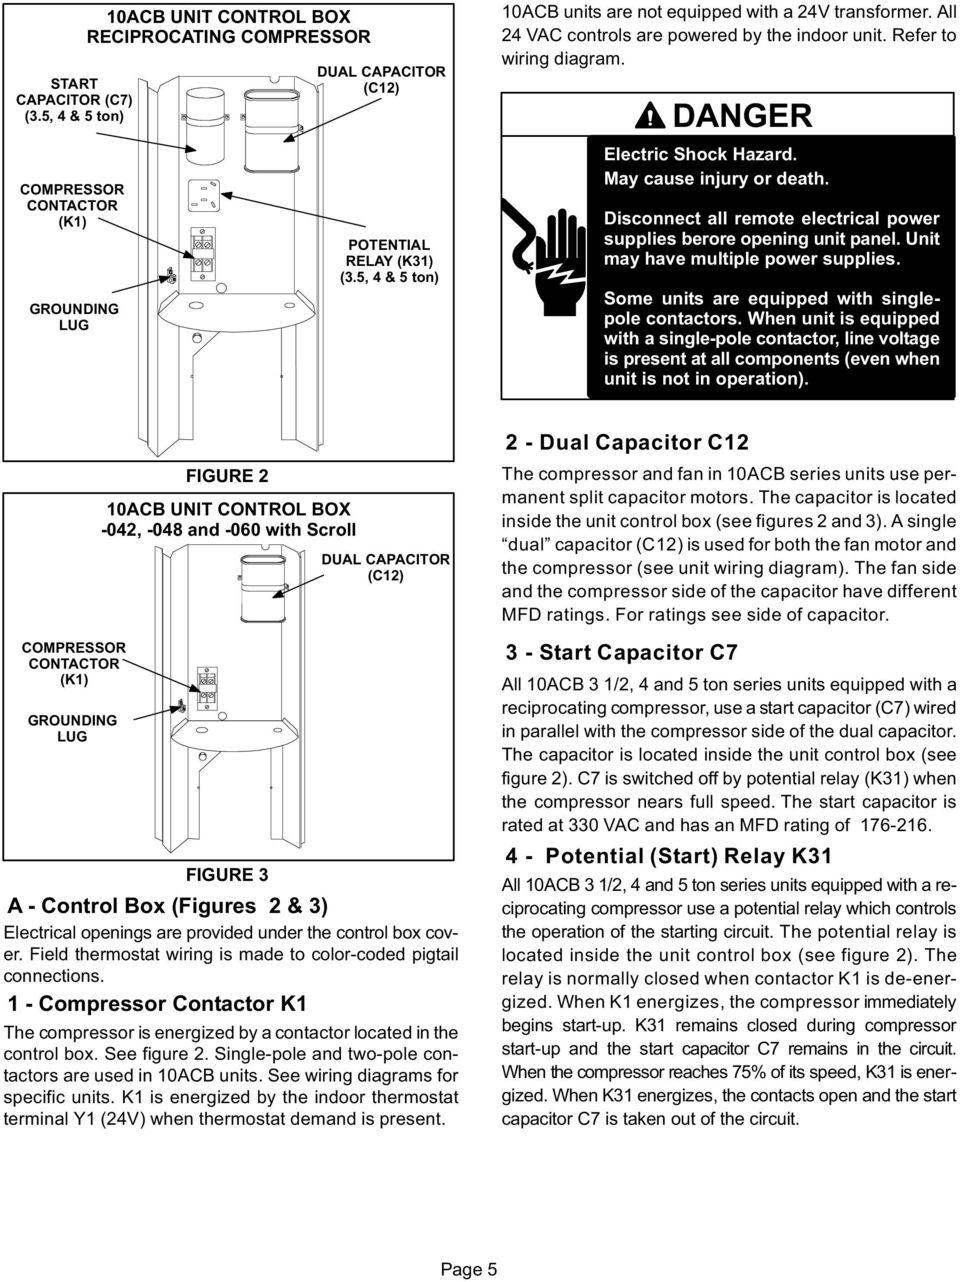 medium resolution of york furnace wiring diagram lennox ac 10acb turnson no blower 10acb warning important pdf york furnace